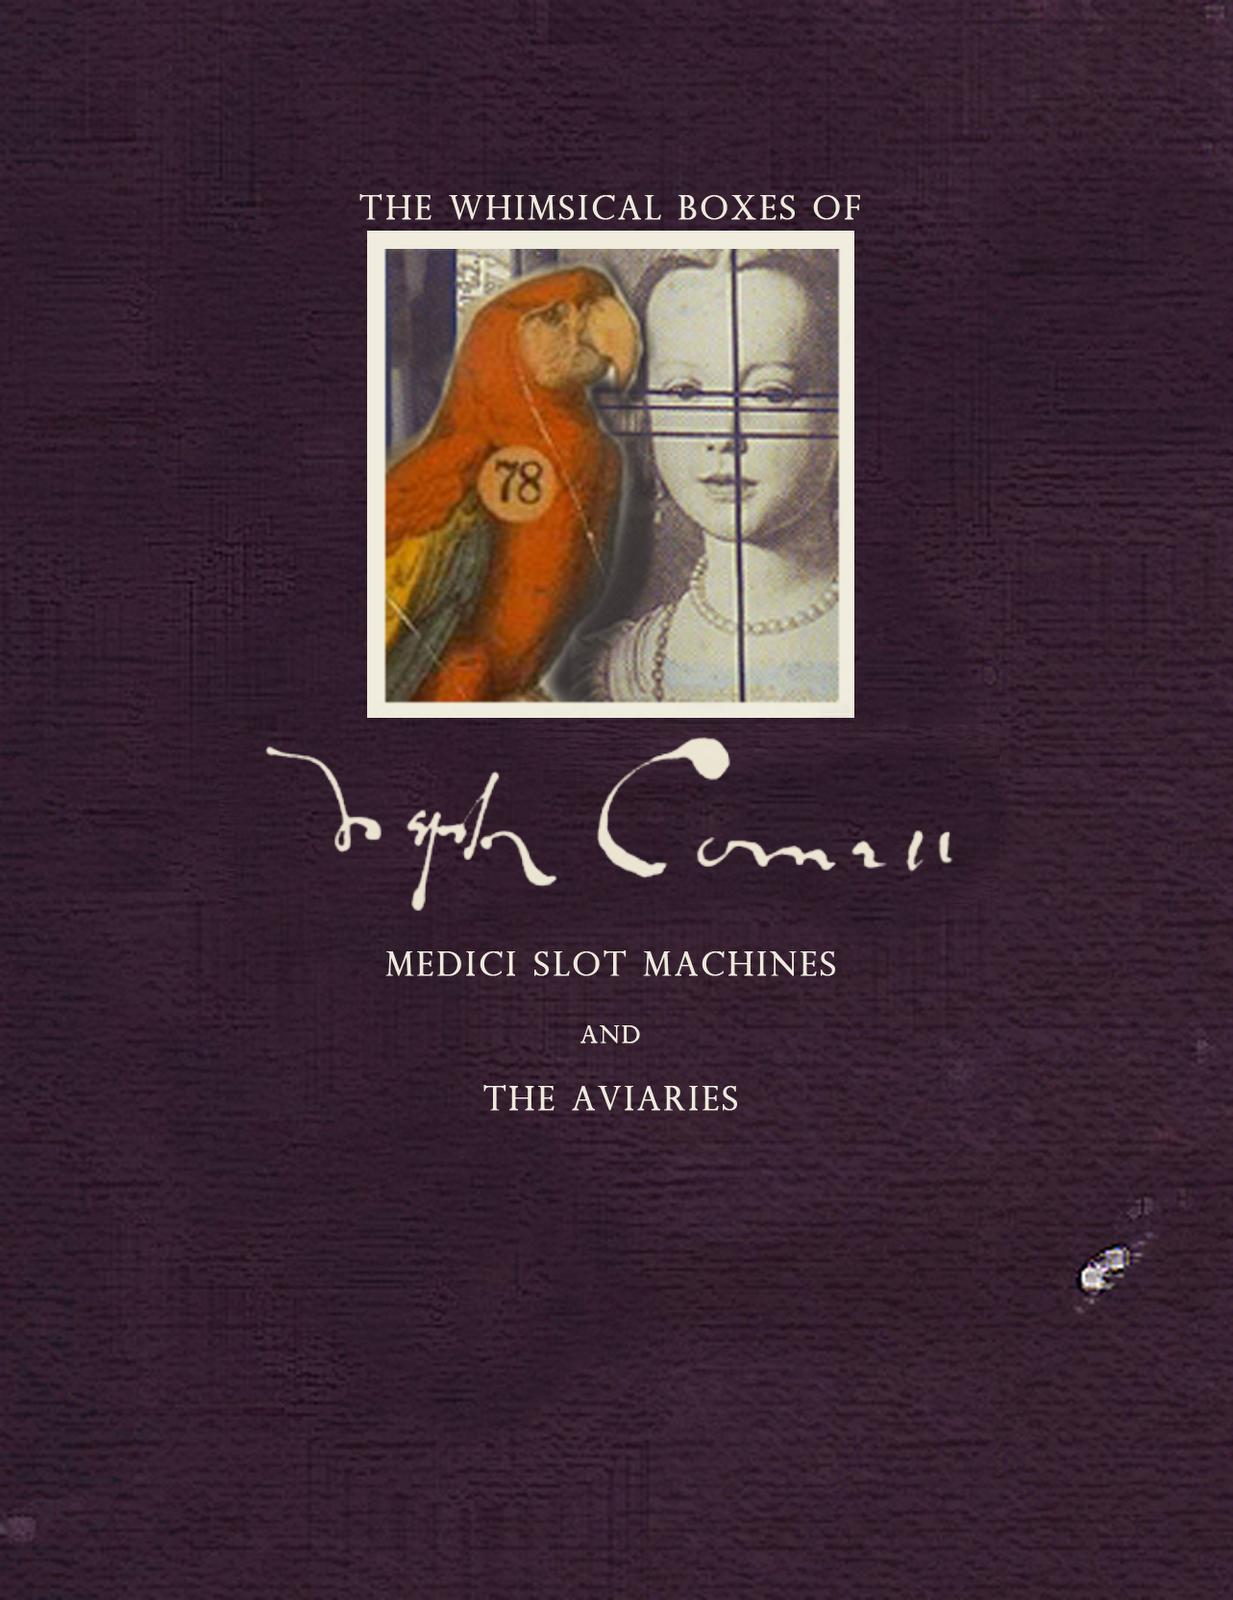 Whimsical Boxes of Joseph Cornell